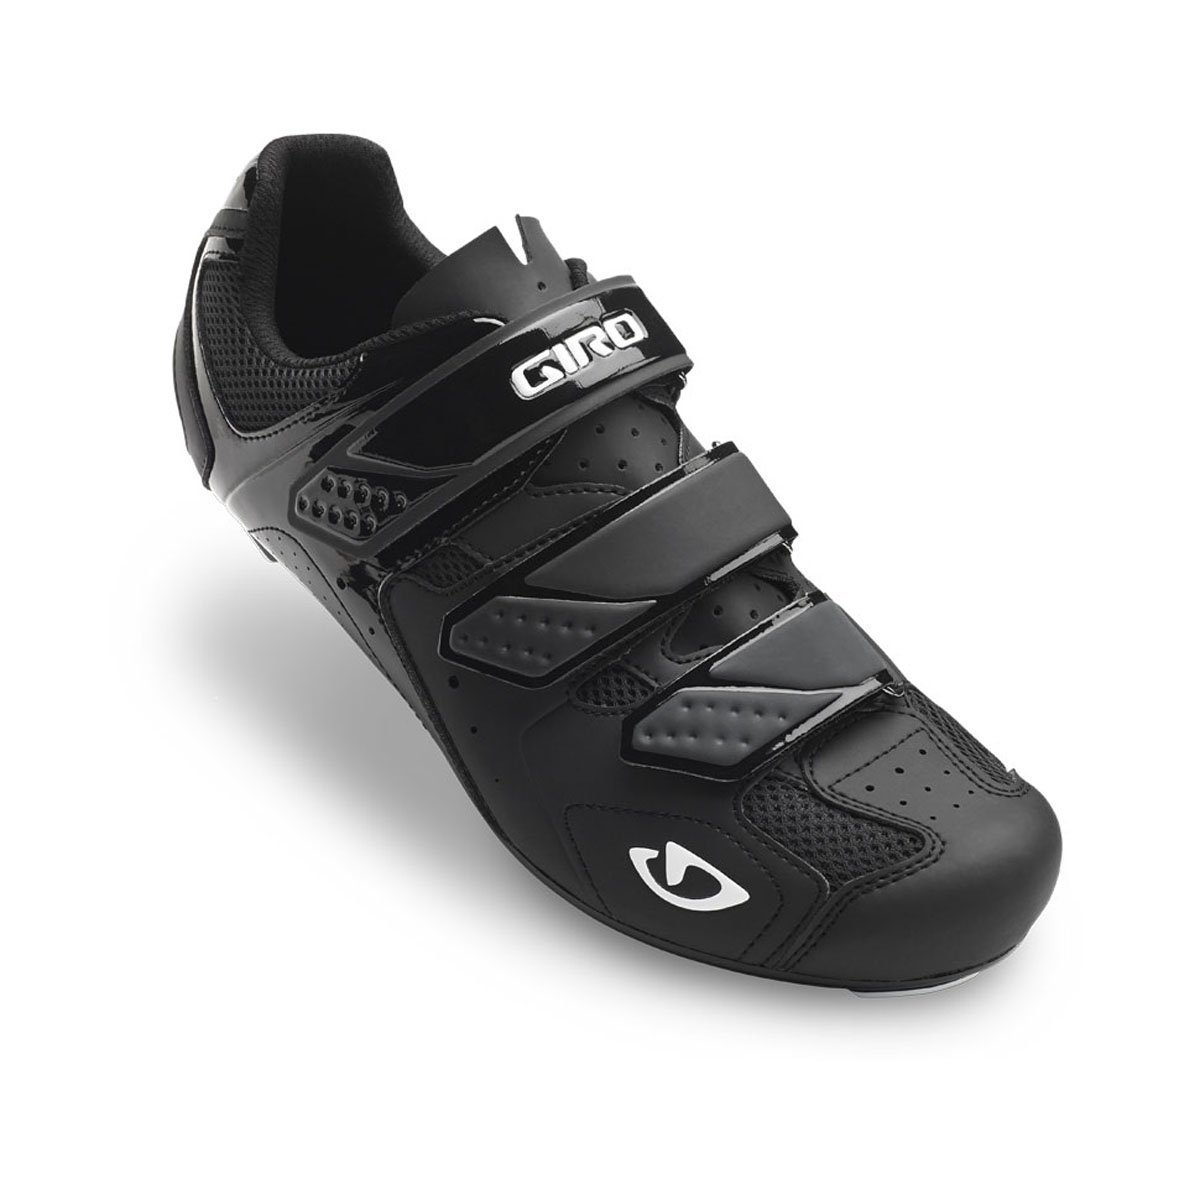 Giro Men's Treble II Bike Shoe B00NERHANQ 39 Matte Black